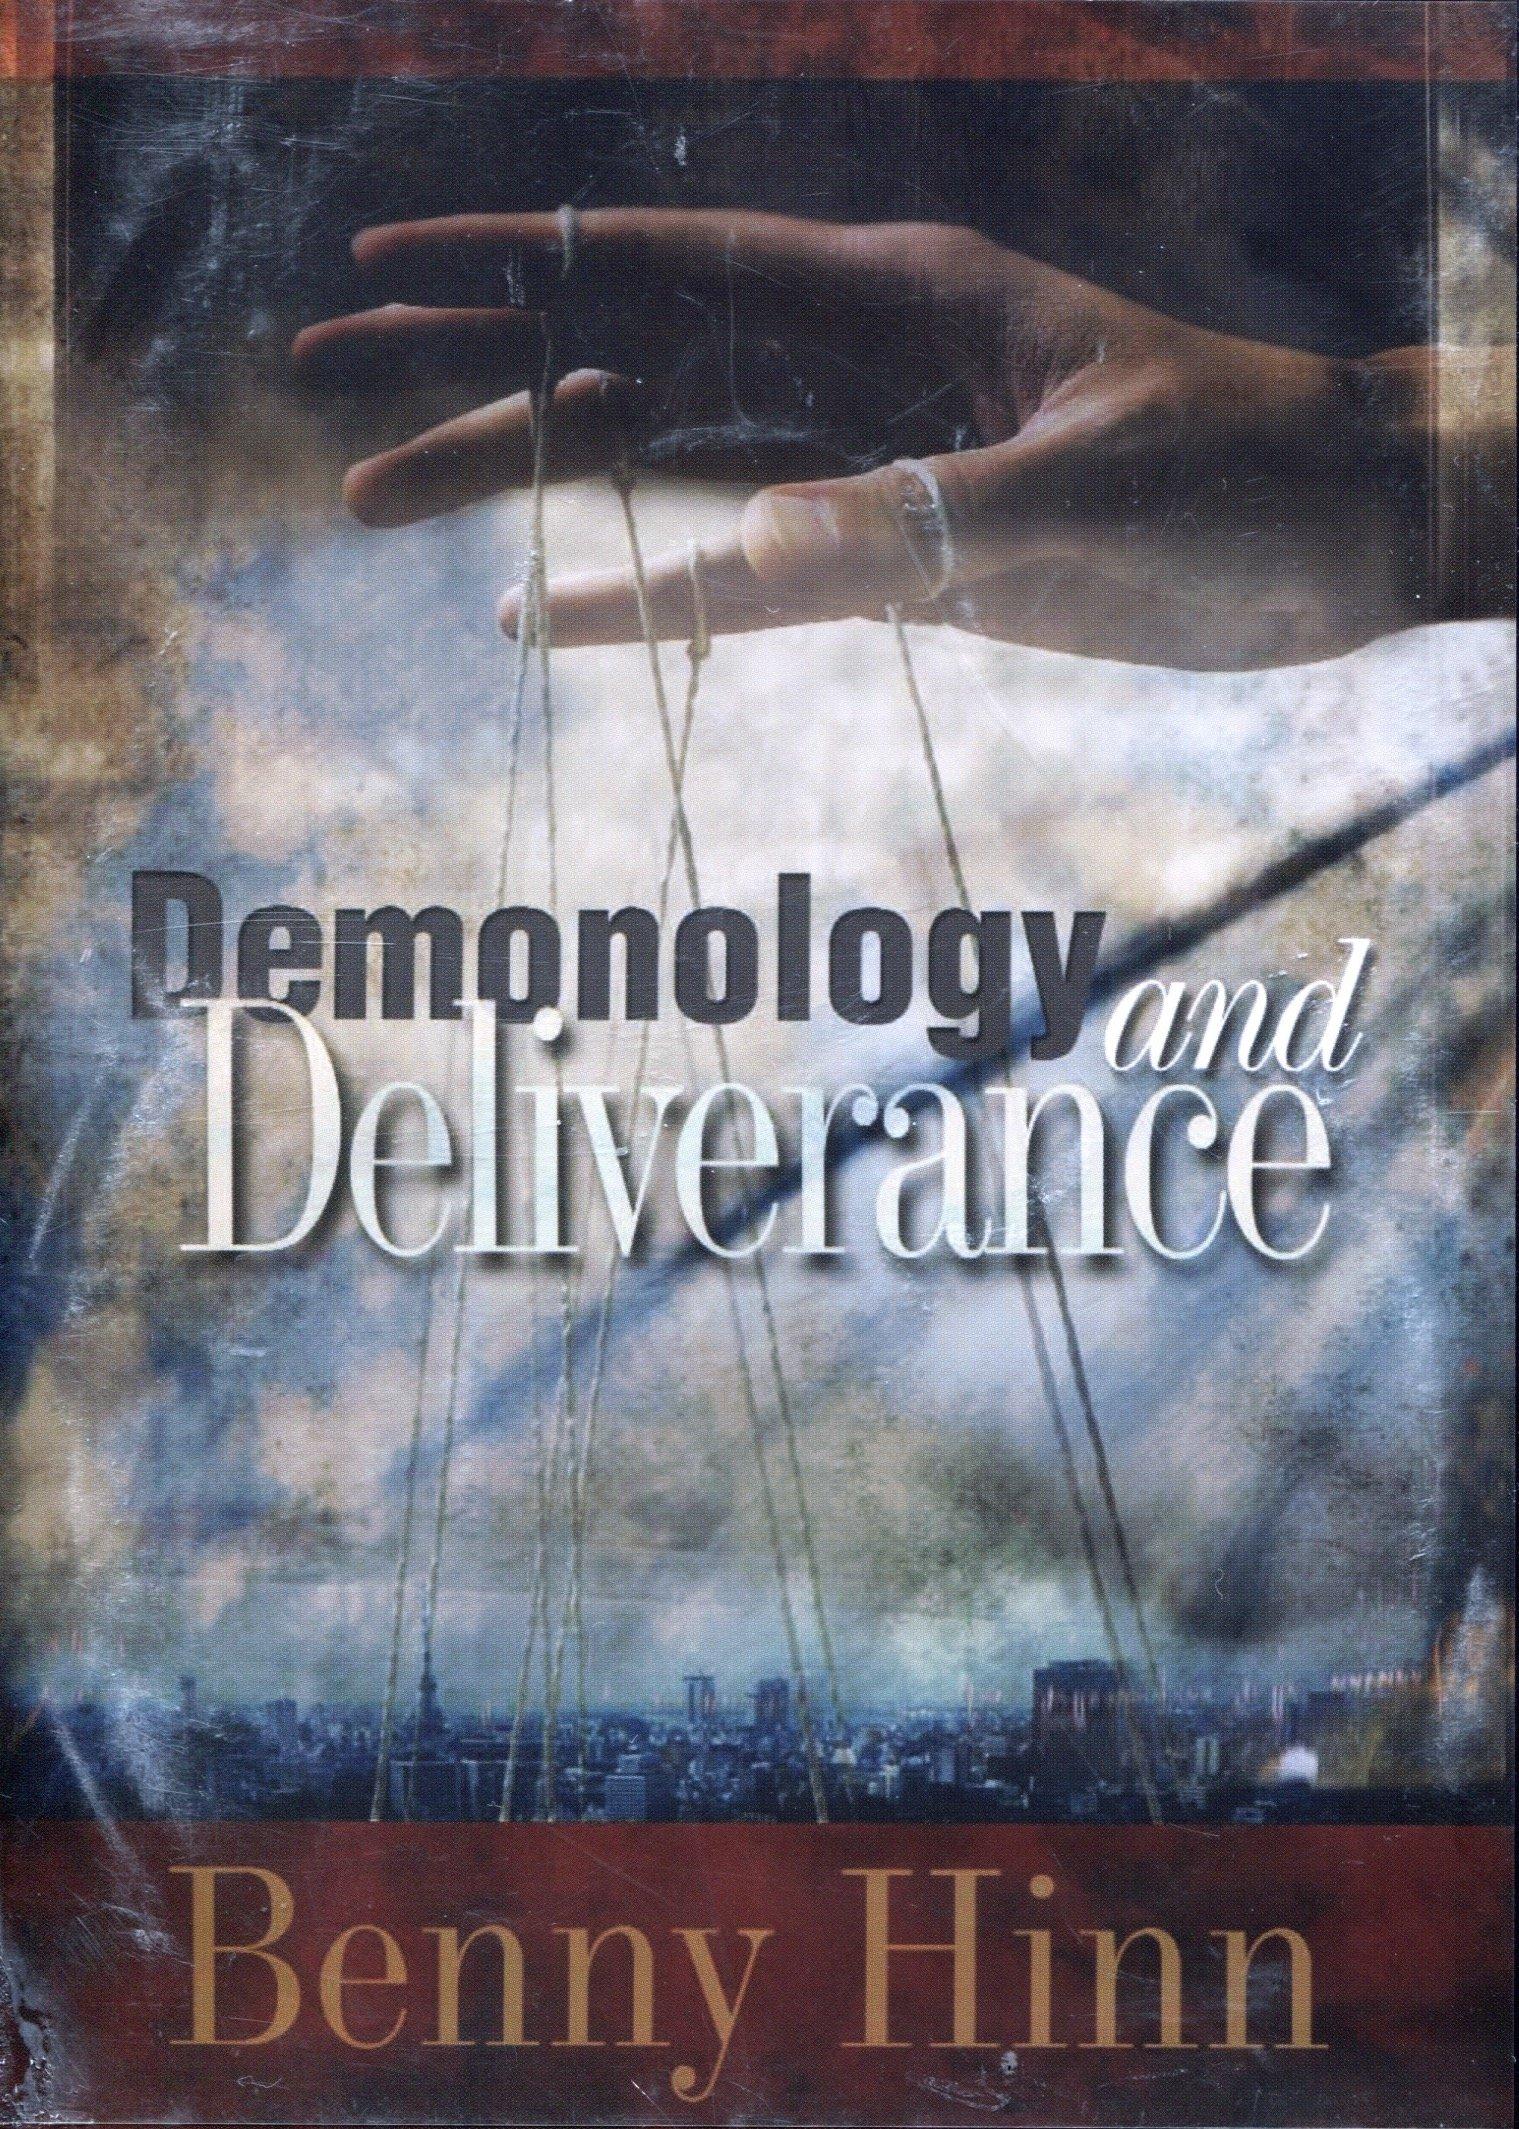 Demonology and Deliverance By Benny Hinn (3 Cd Set): Benny